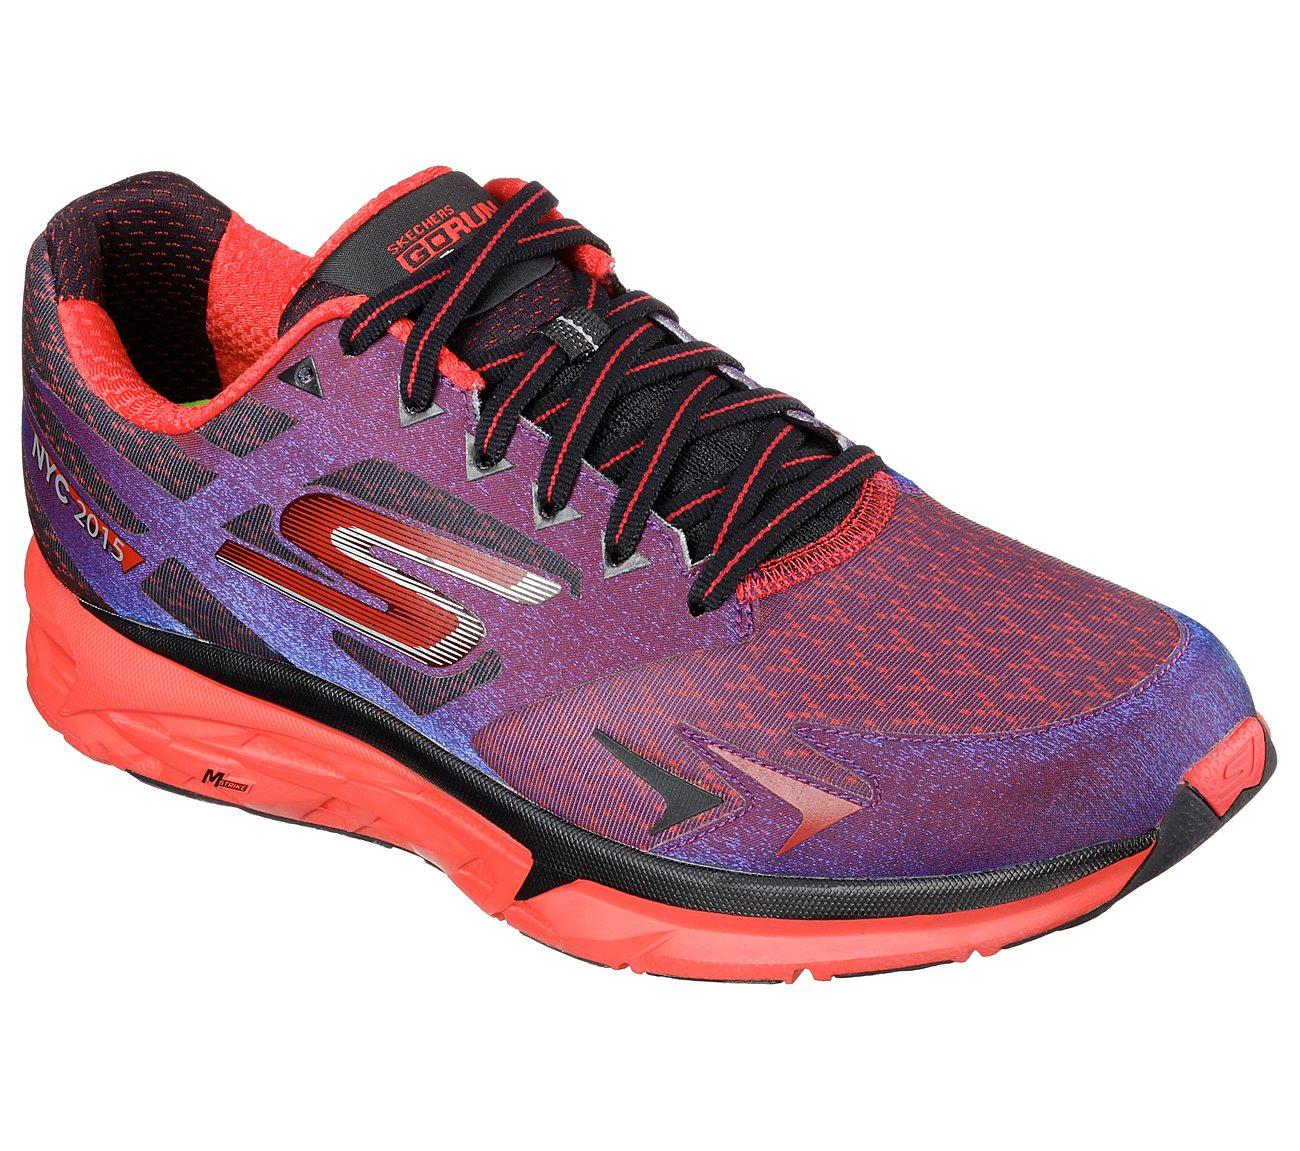 skechers running shoes for women 2015